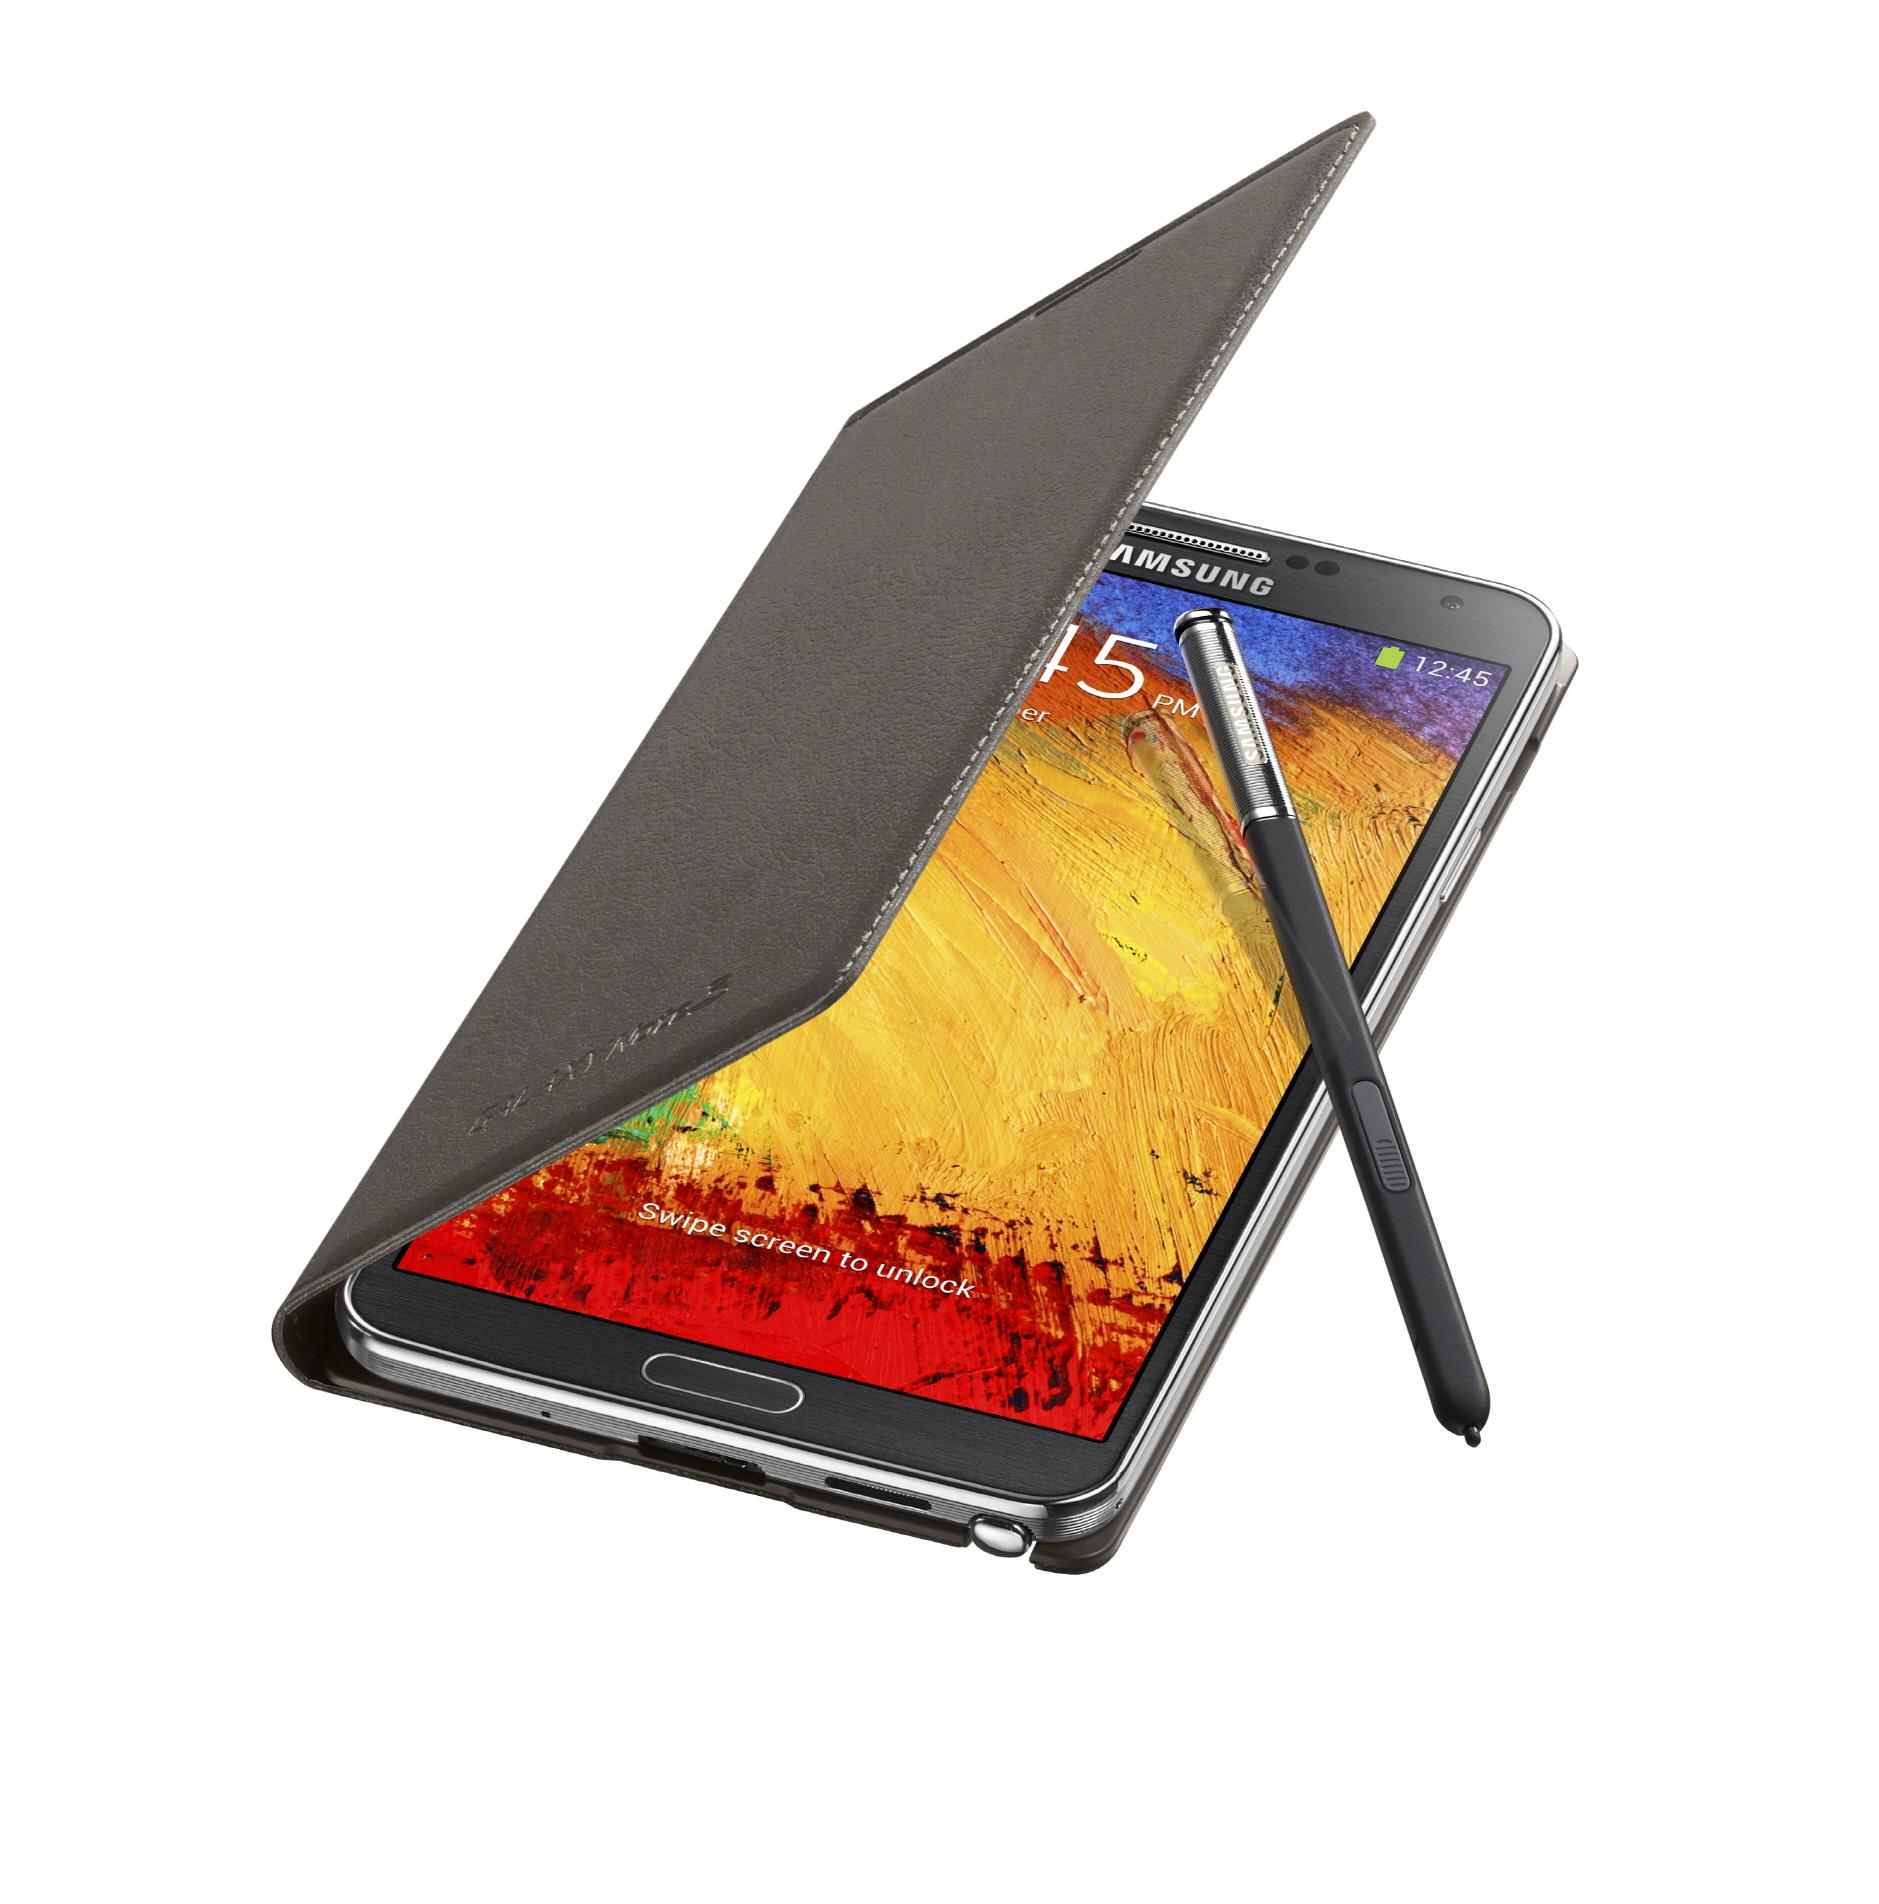 Samsung Galaxy Note 3 Release Date Mini Roundup